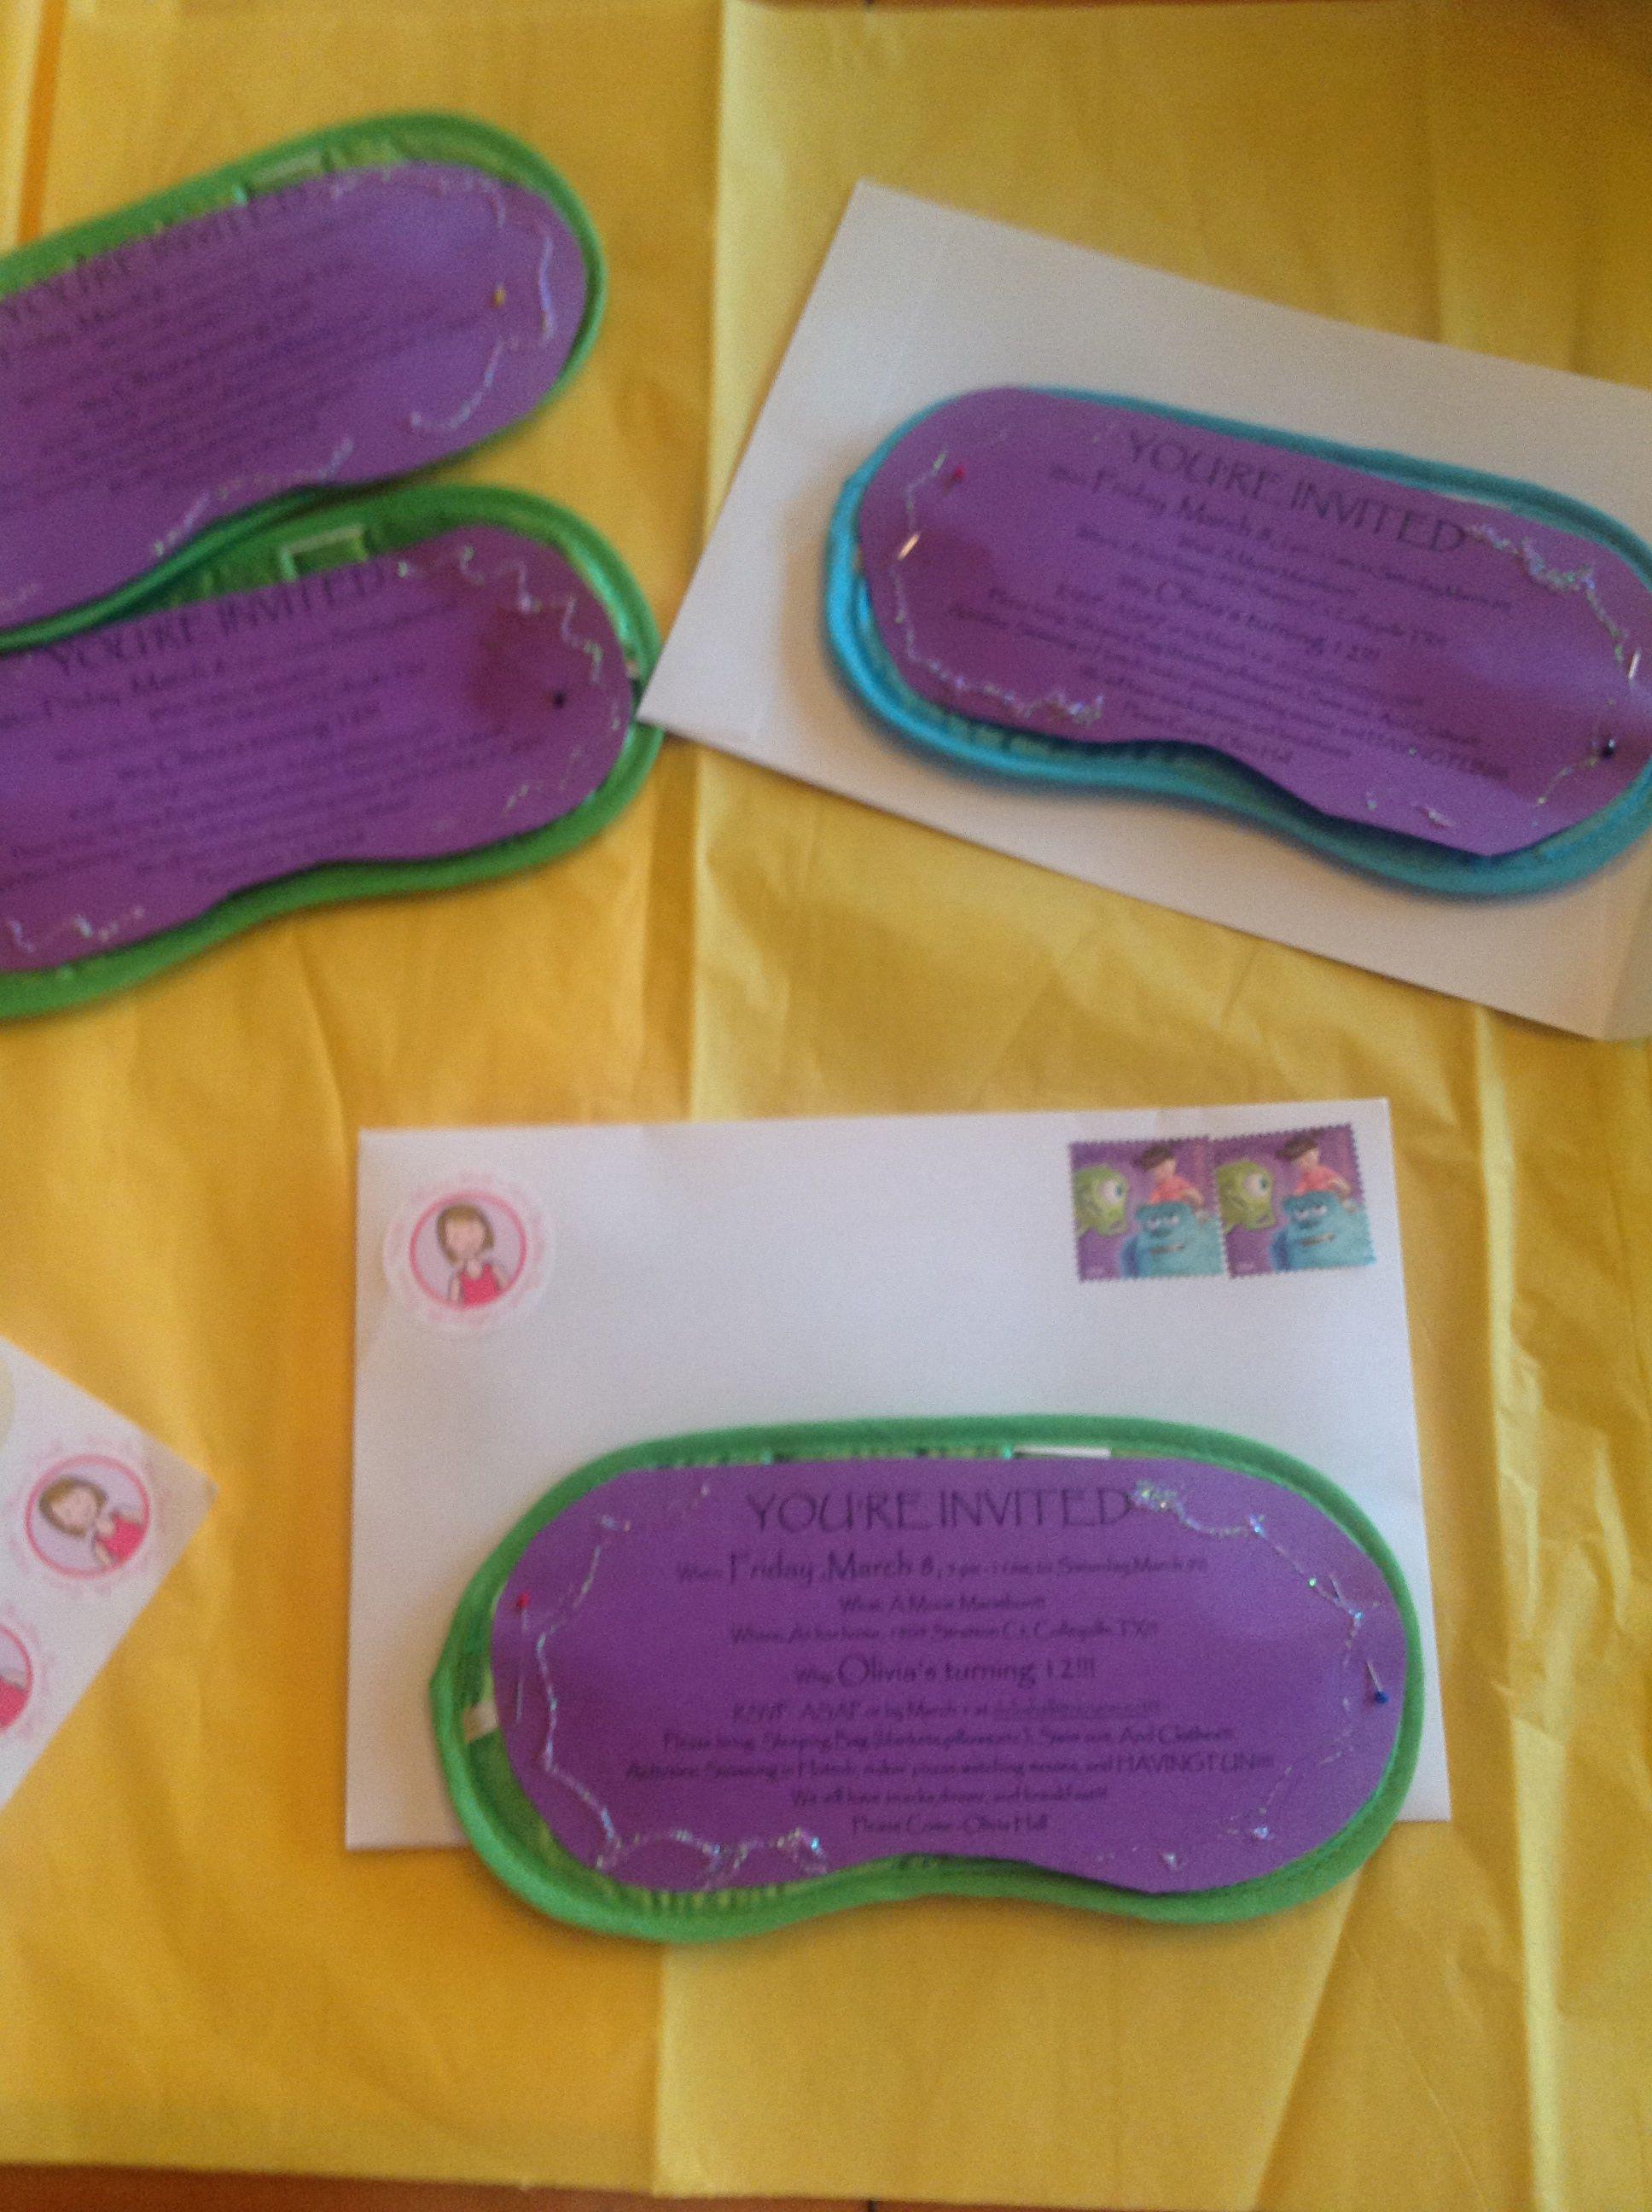 12 Year Old Birthday Party Invitations On Sleep Mask Sleepover